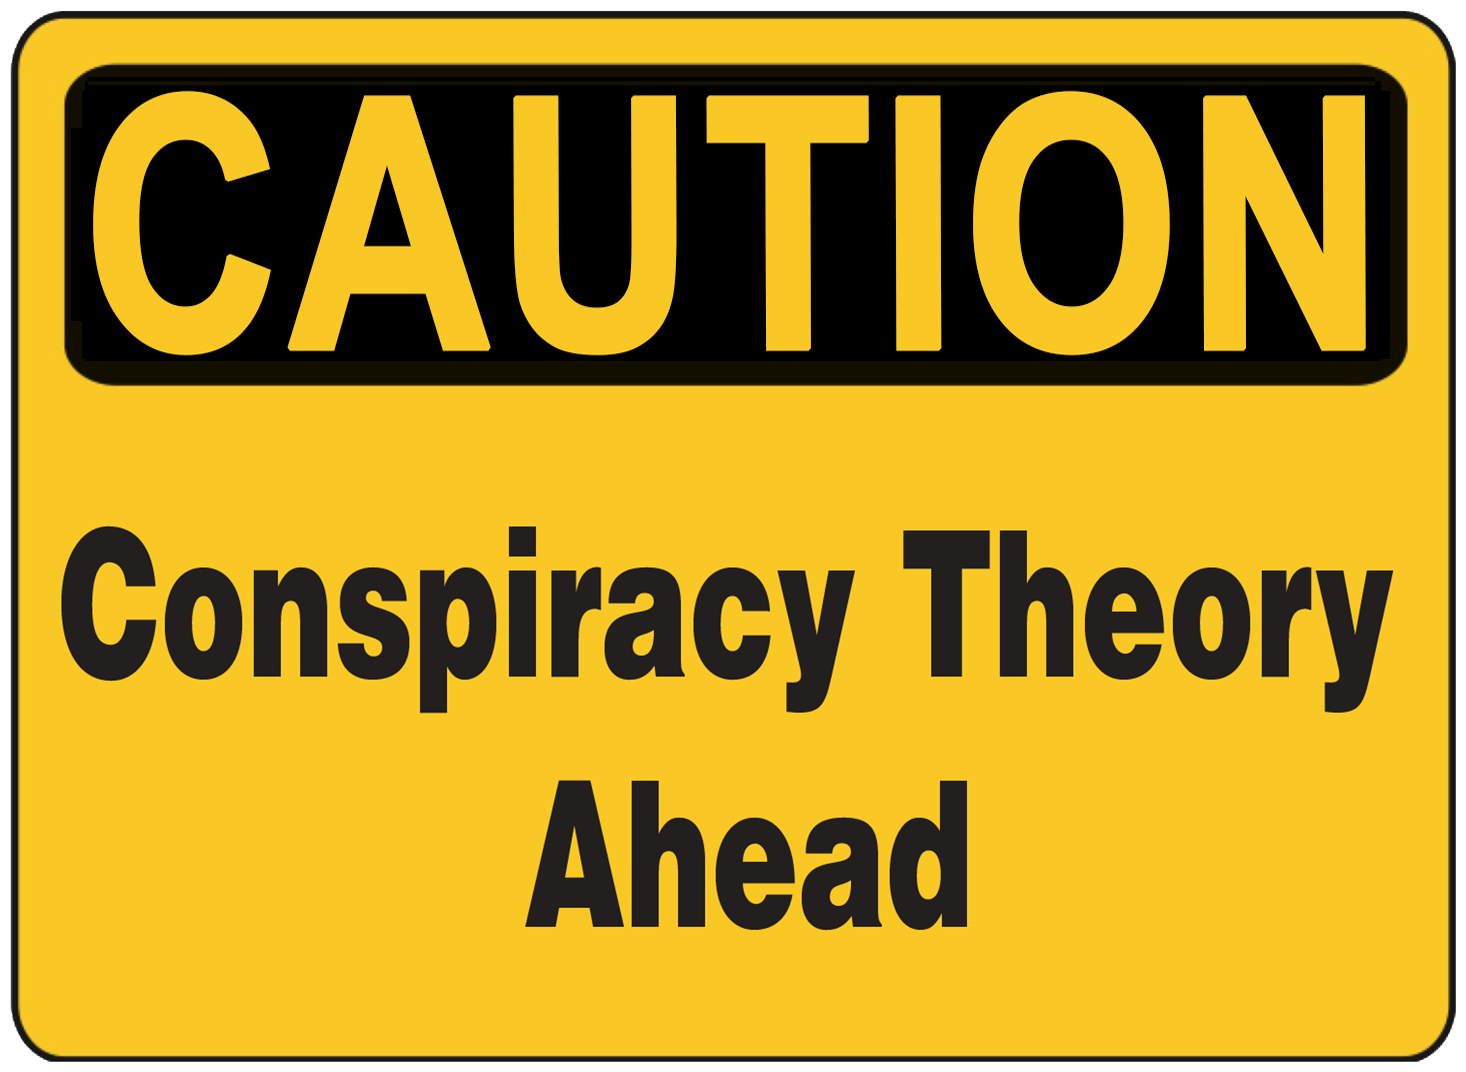 CAUTION - Conspiracy Theory Ahead